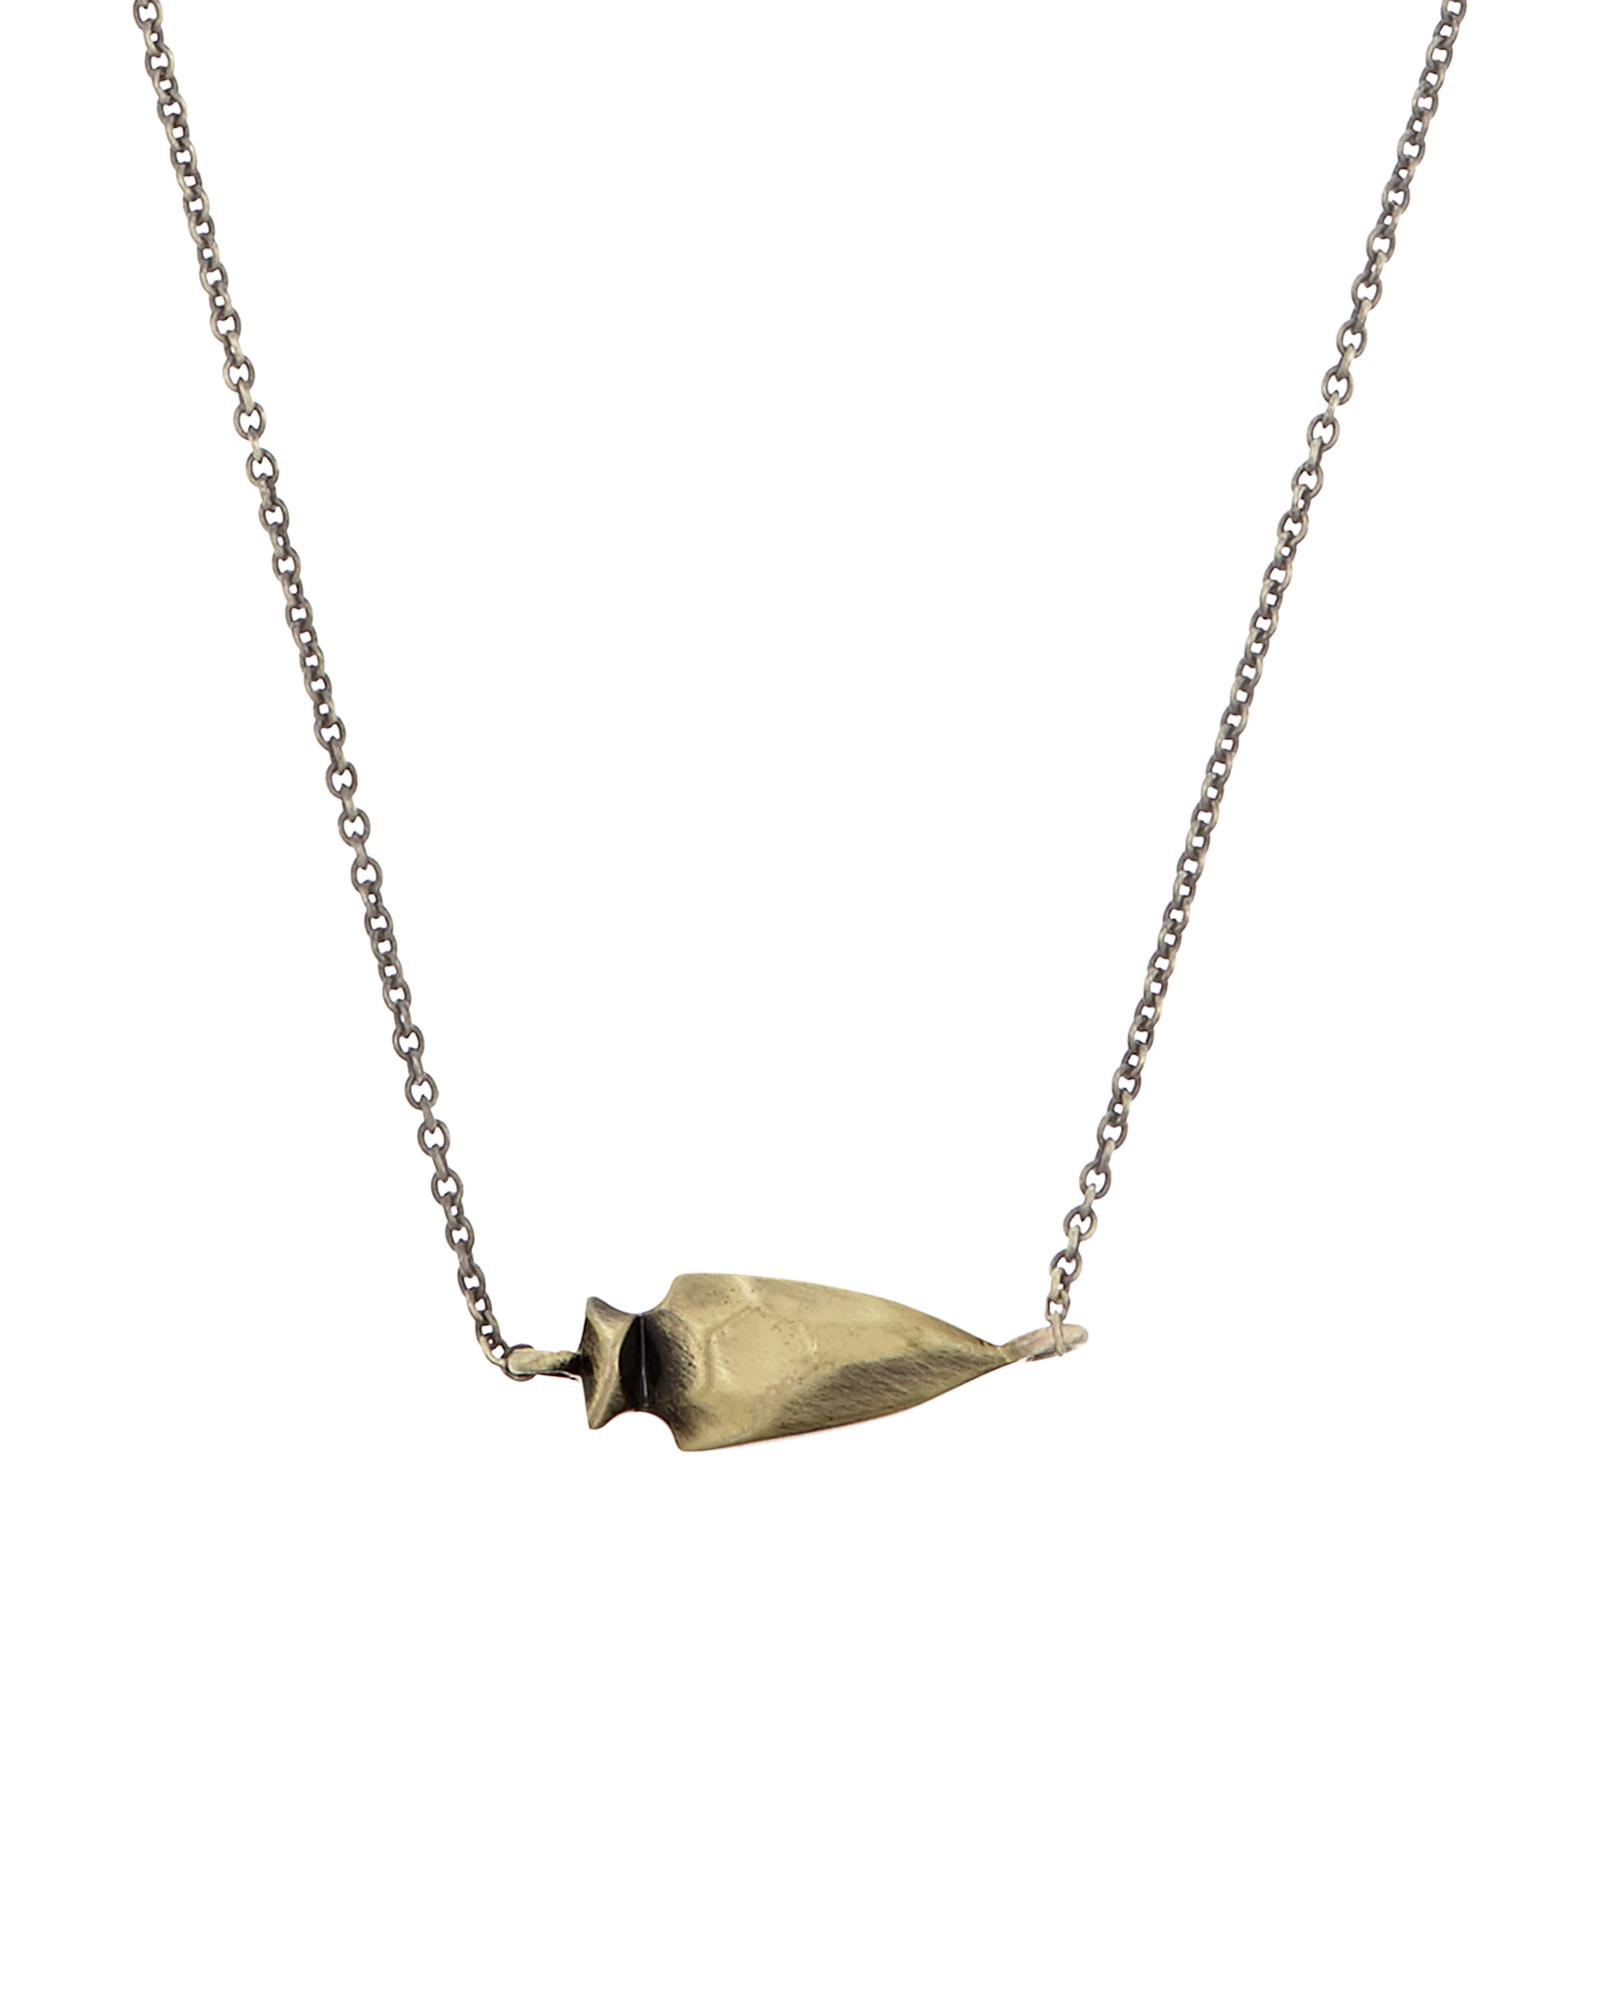 Steph brass arrowhead pendant necklace kendra scott steph pendant necklace in antique brass aloadofball Images